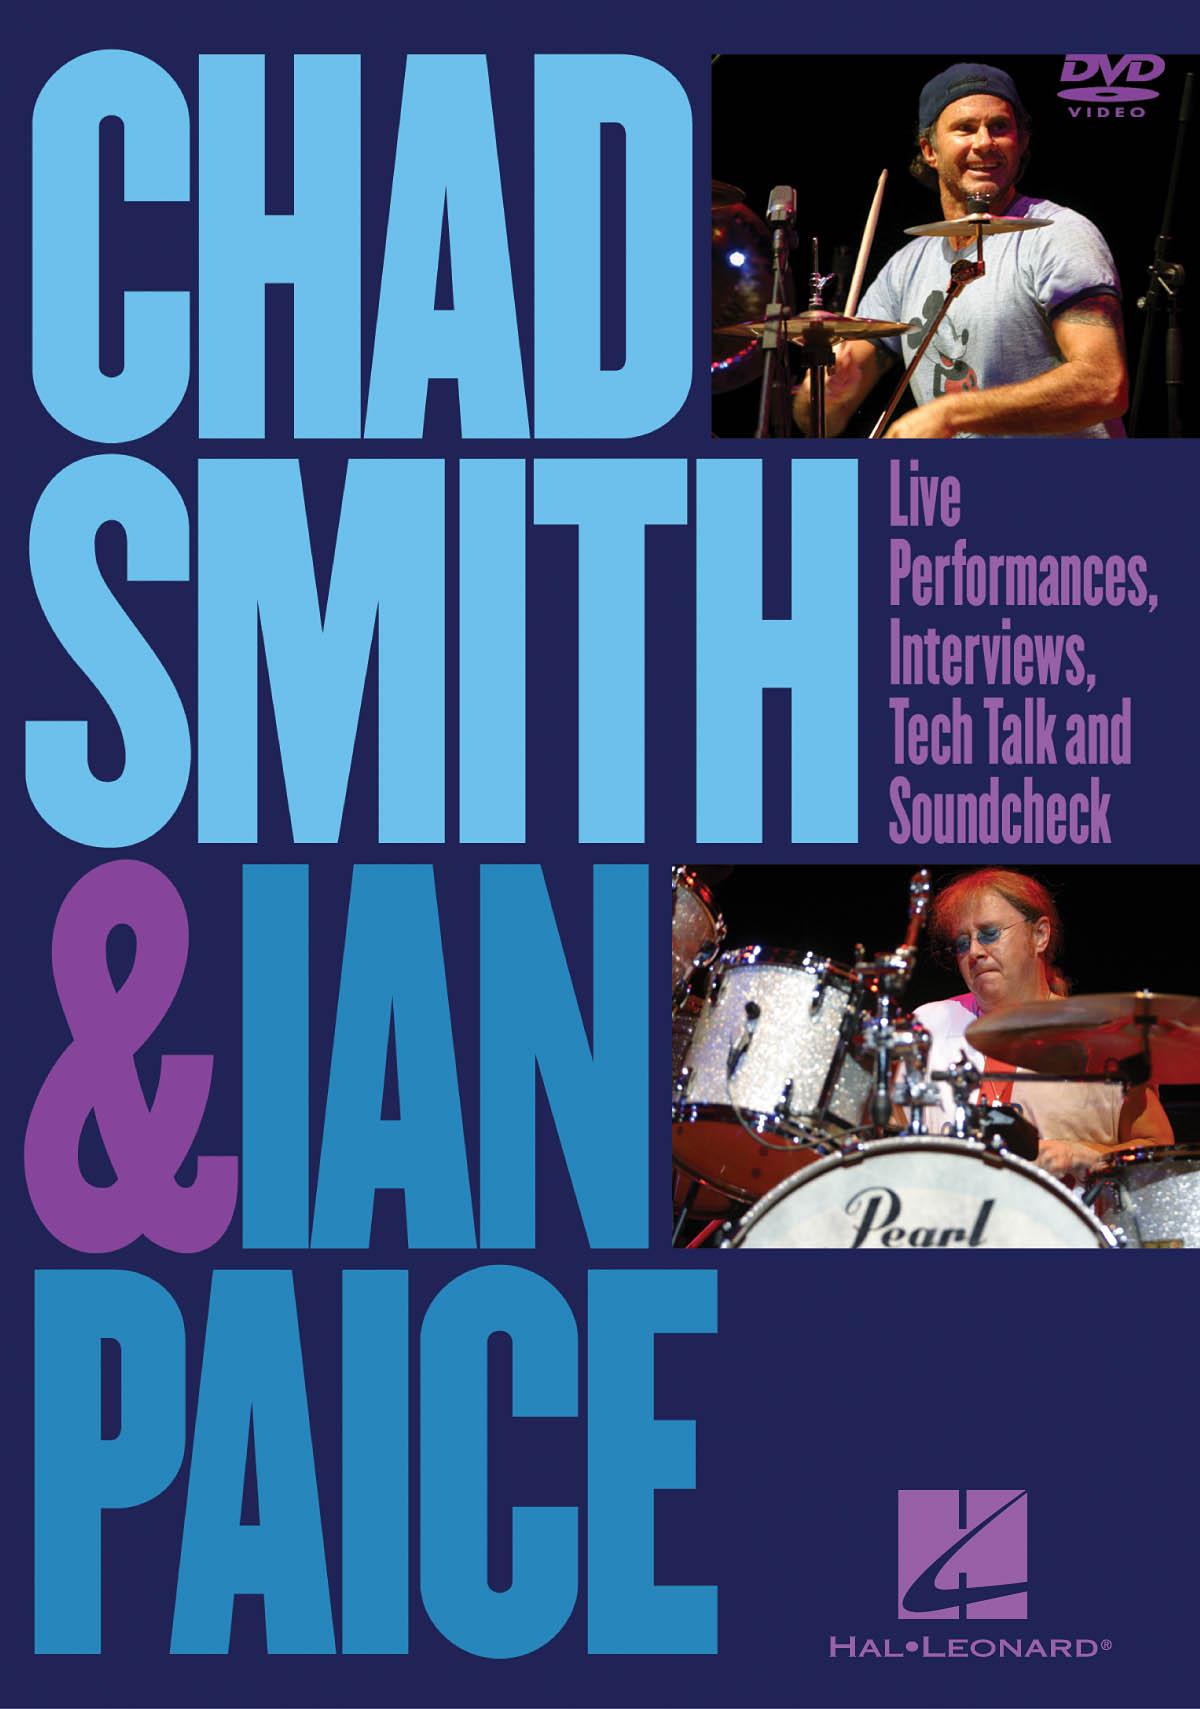 Chad Smith Ian Paice: Chad Smith & Ian Paice: Drums: Artist Songbook